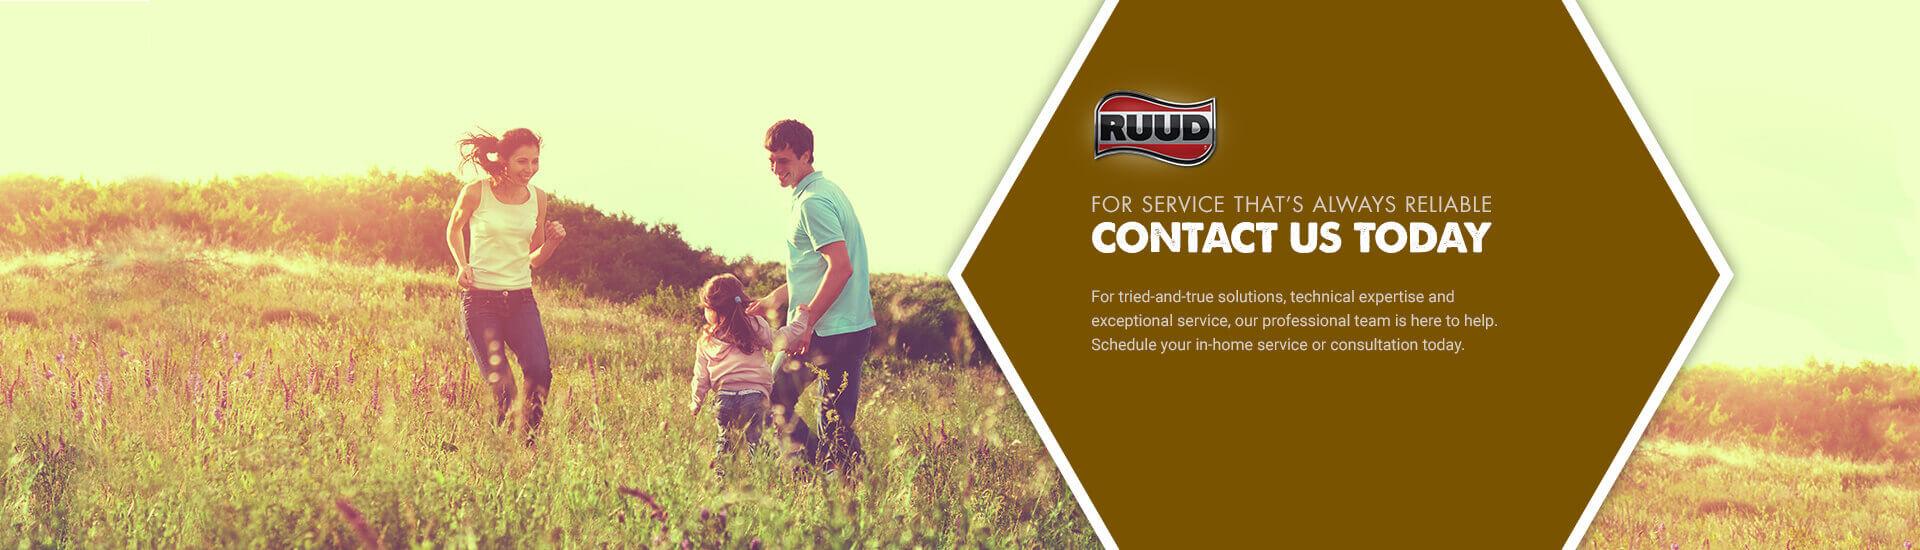 Ruud HVAC Contractor